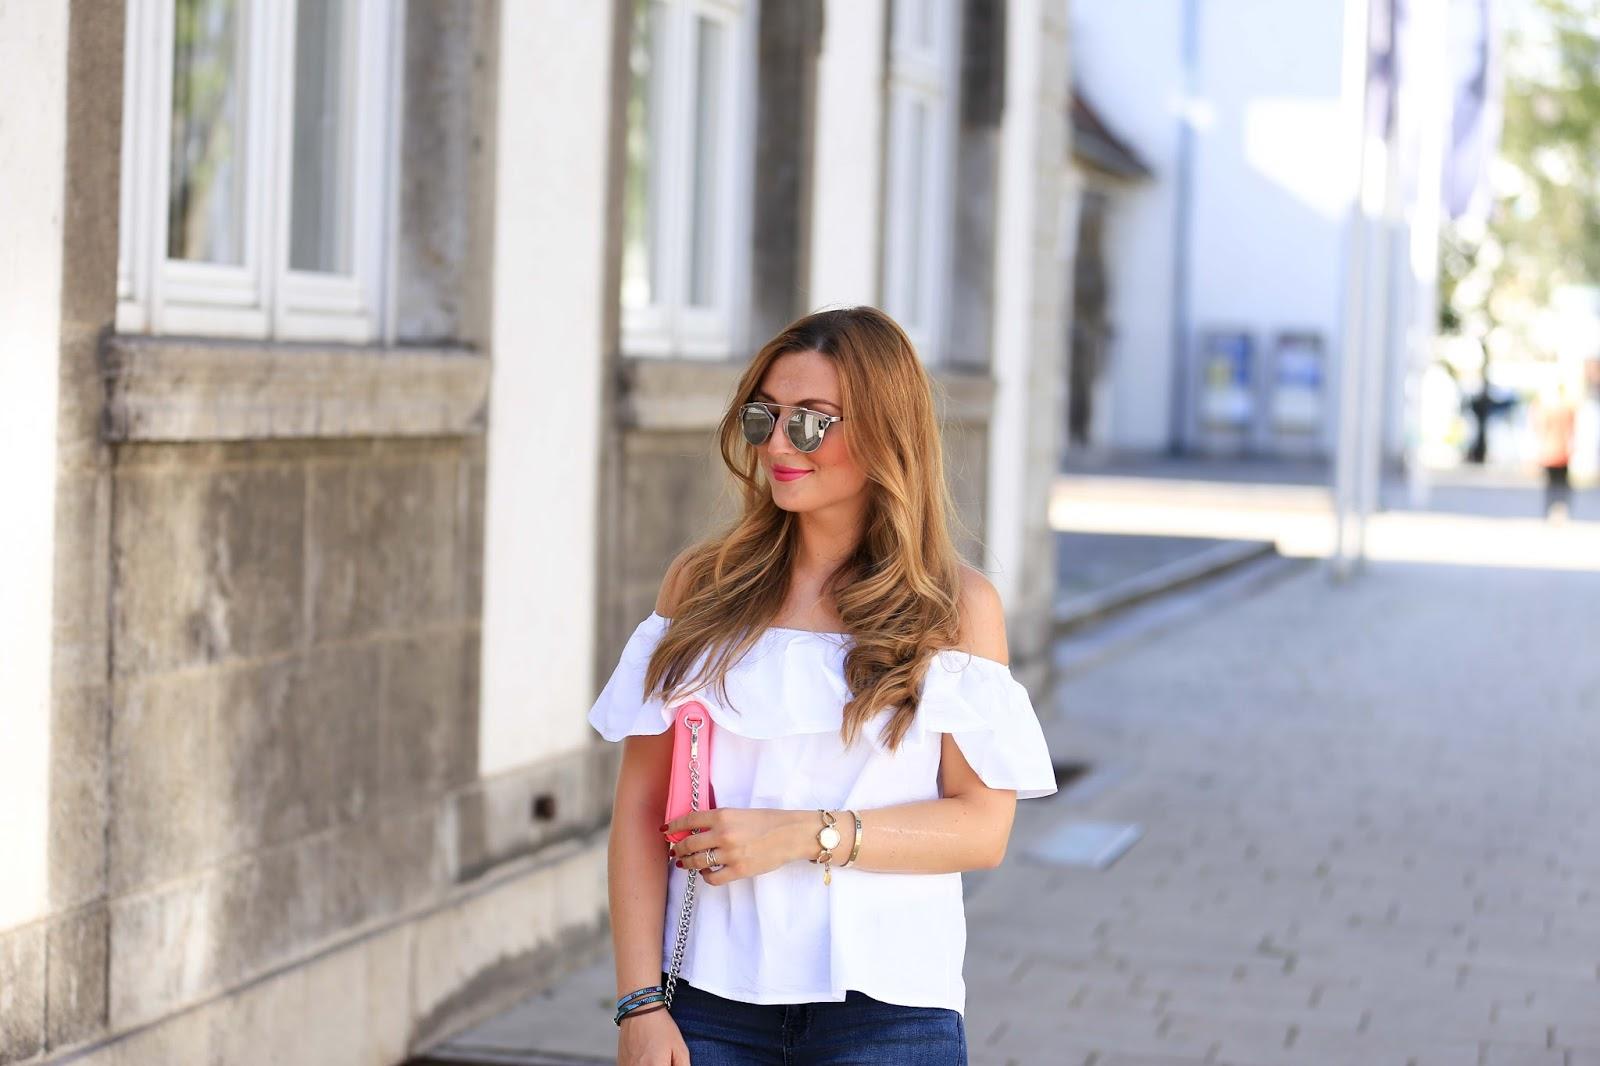 Rebecca Minkoff tasche Blogger - pinke tasche kombinieren MyColloseum  - fashionstylebyjohanna-fashionblog-frankfurt-styleblog-Outdoorblogger-blogger-deutschland-fashionblogger-bloggerdeutschland-lifestyleblog-modeblog-germanblogger-